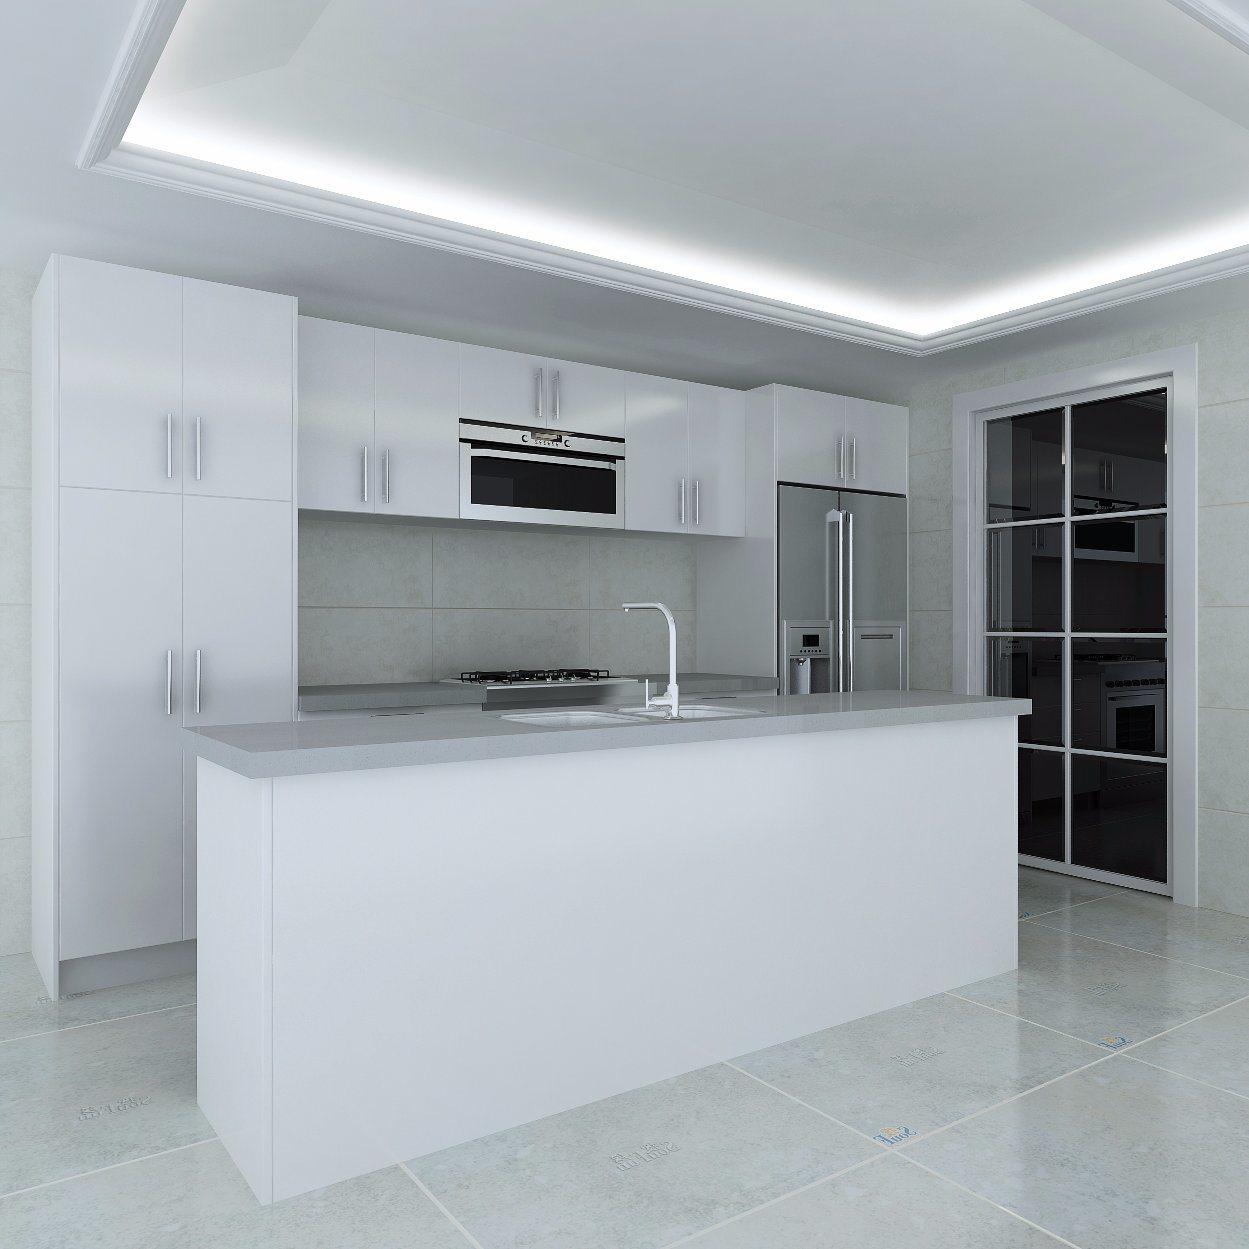 China Show Room Modern Design Modular Kitchen Cabinet Furniture with ...